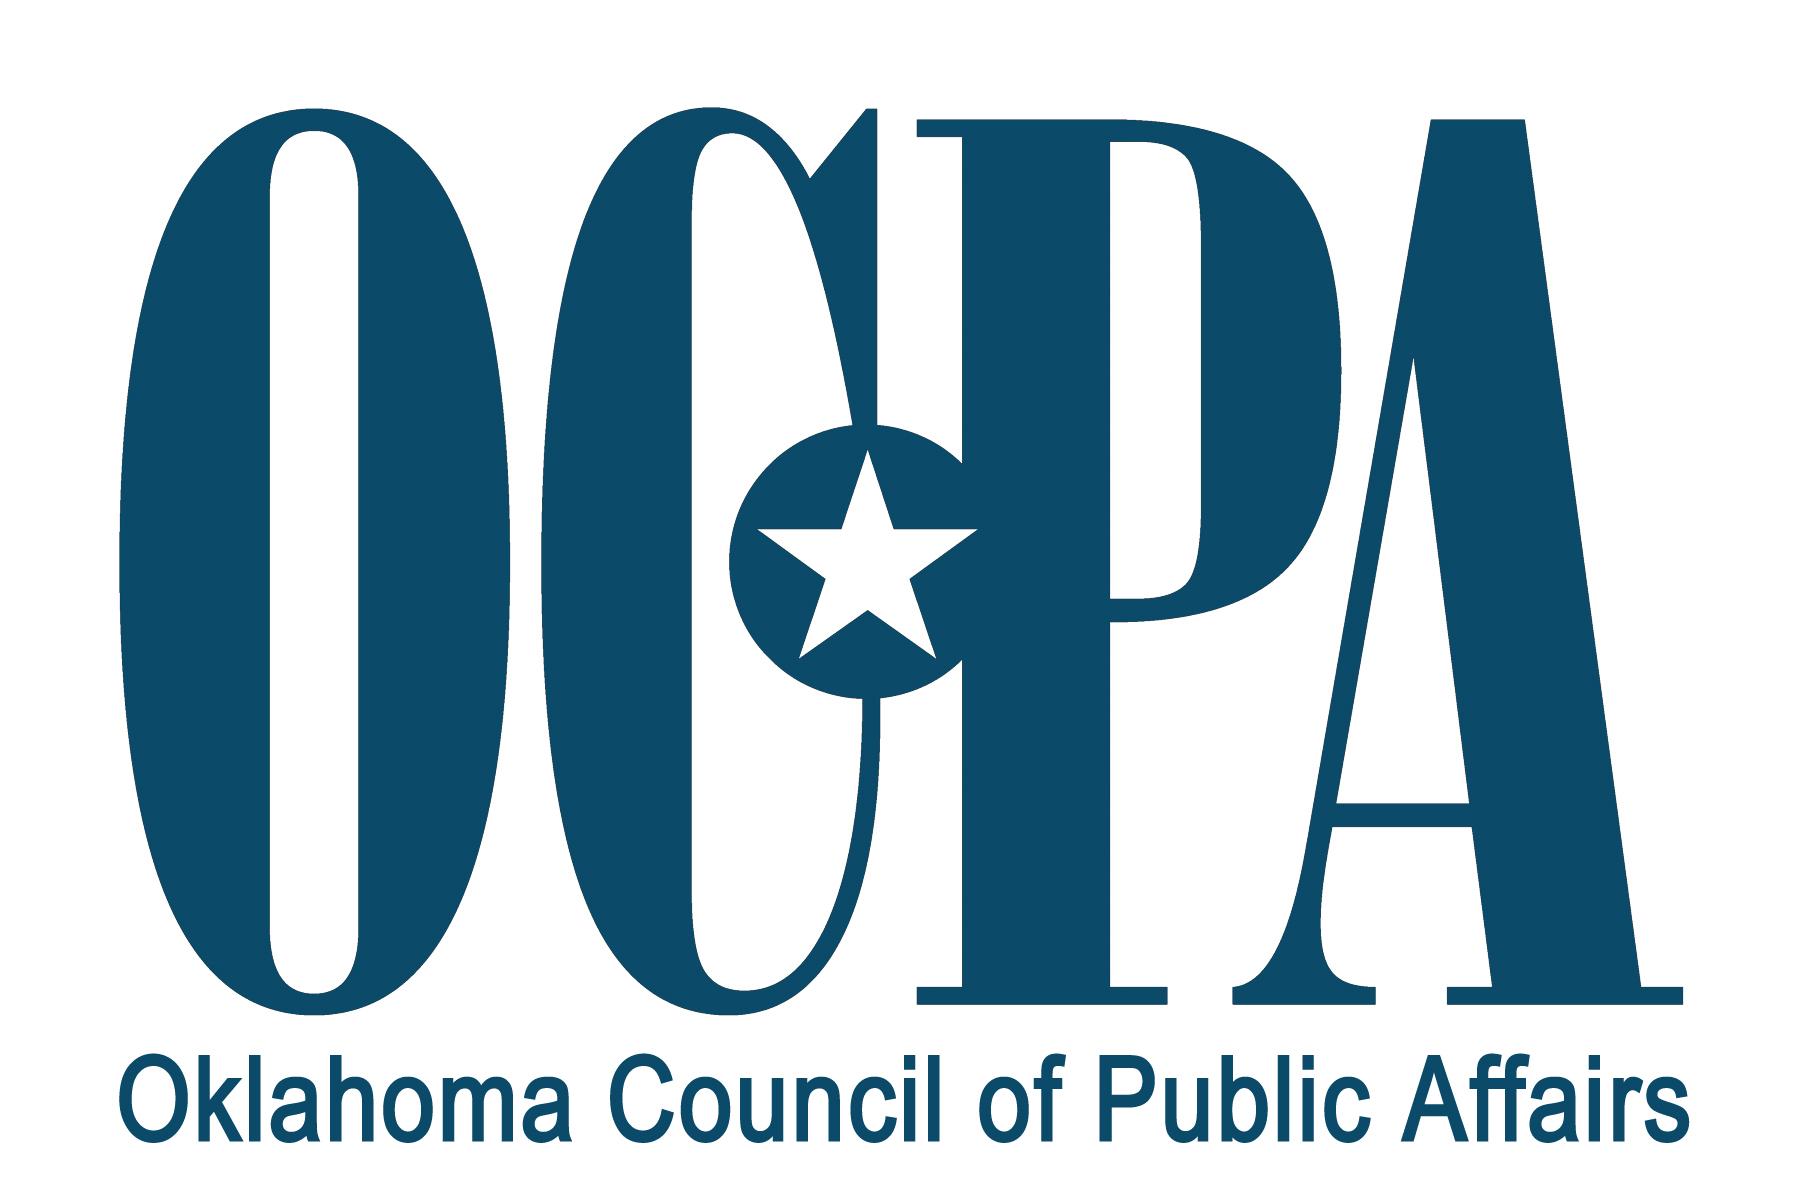 OCPA logo